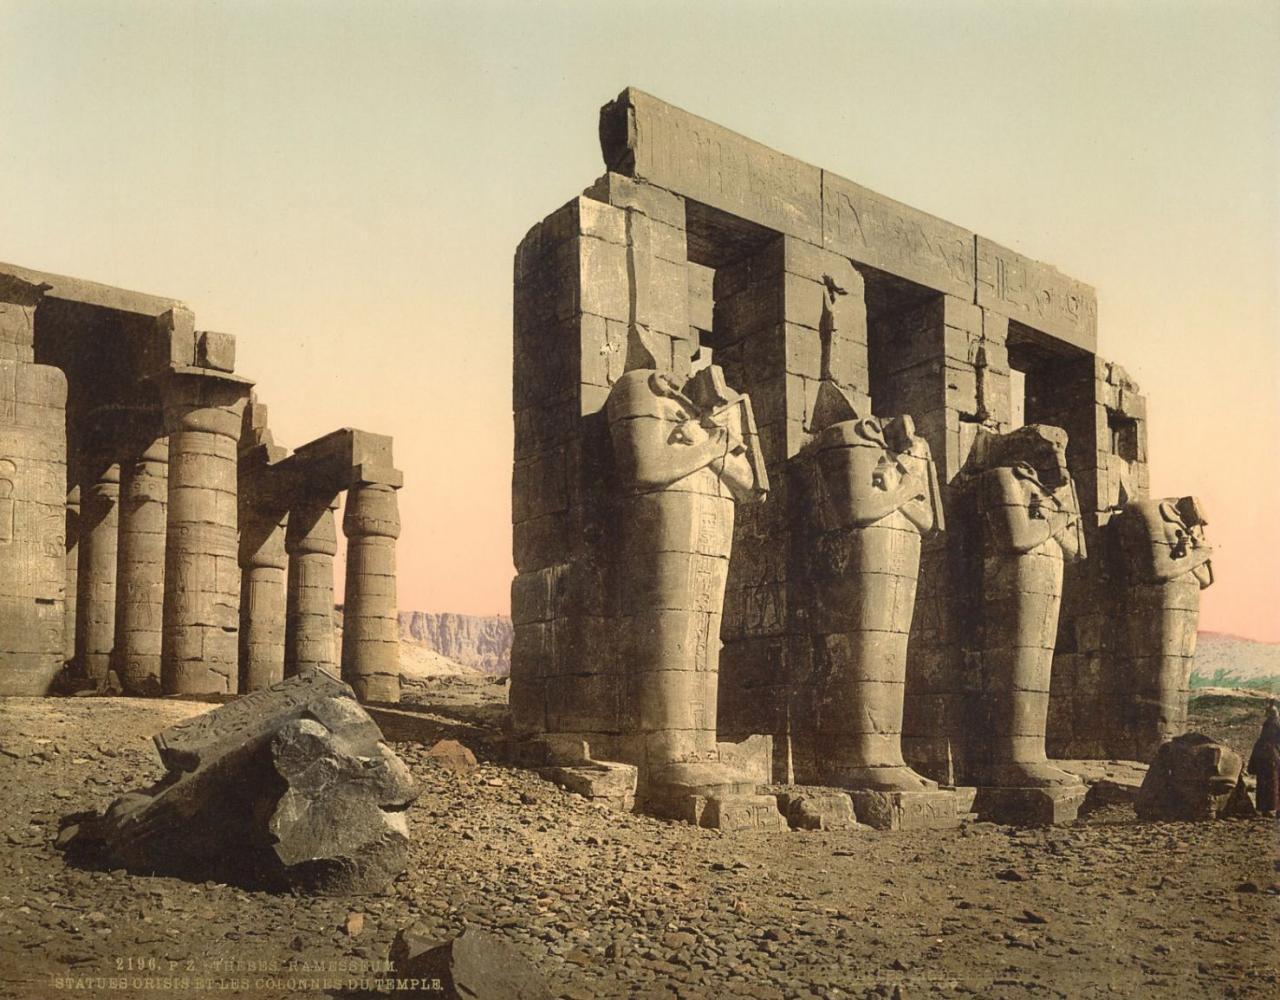 PZ vintage photochrome. Circa 1897.